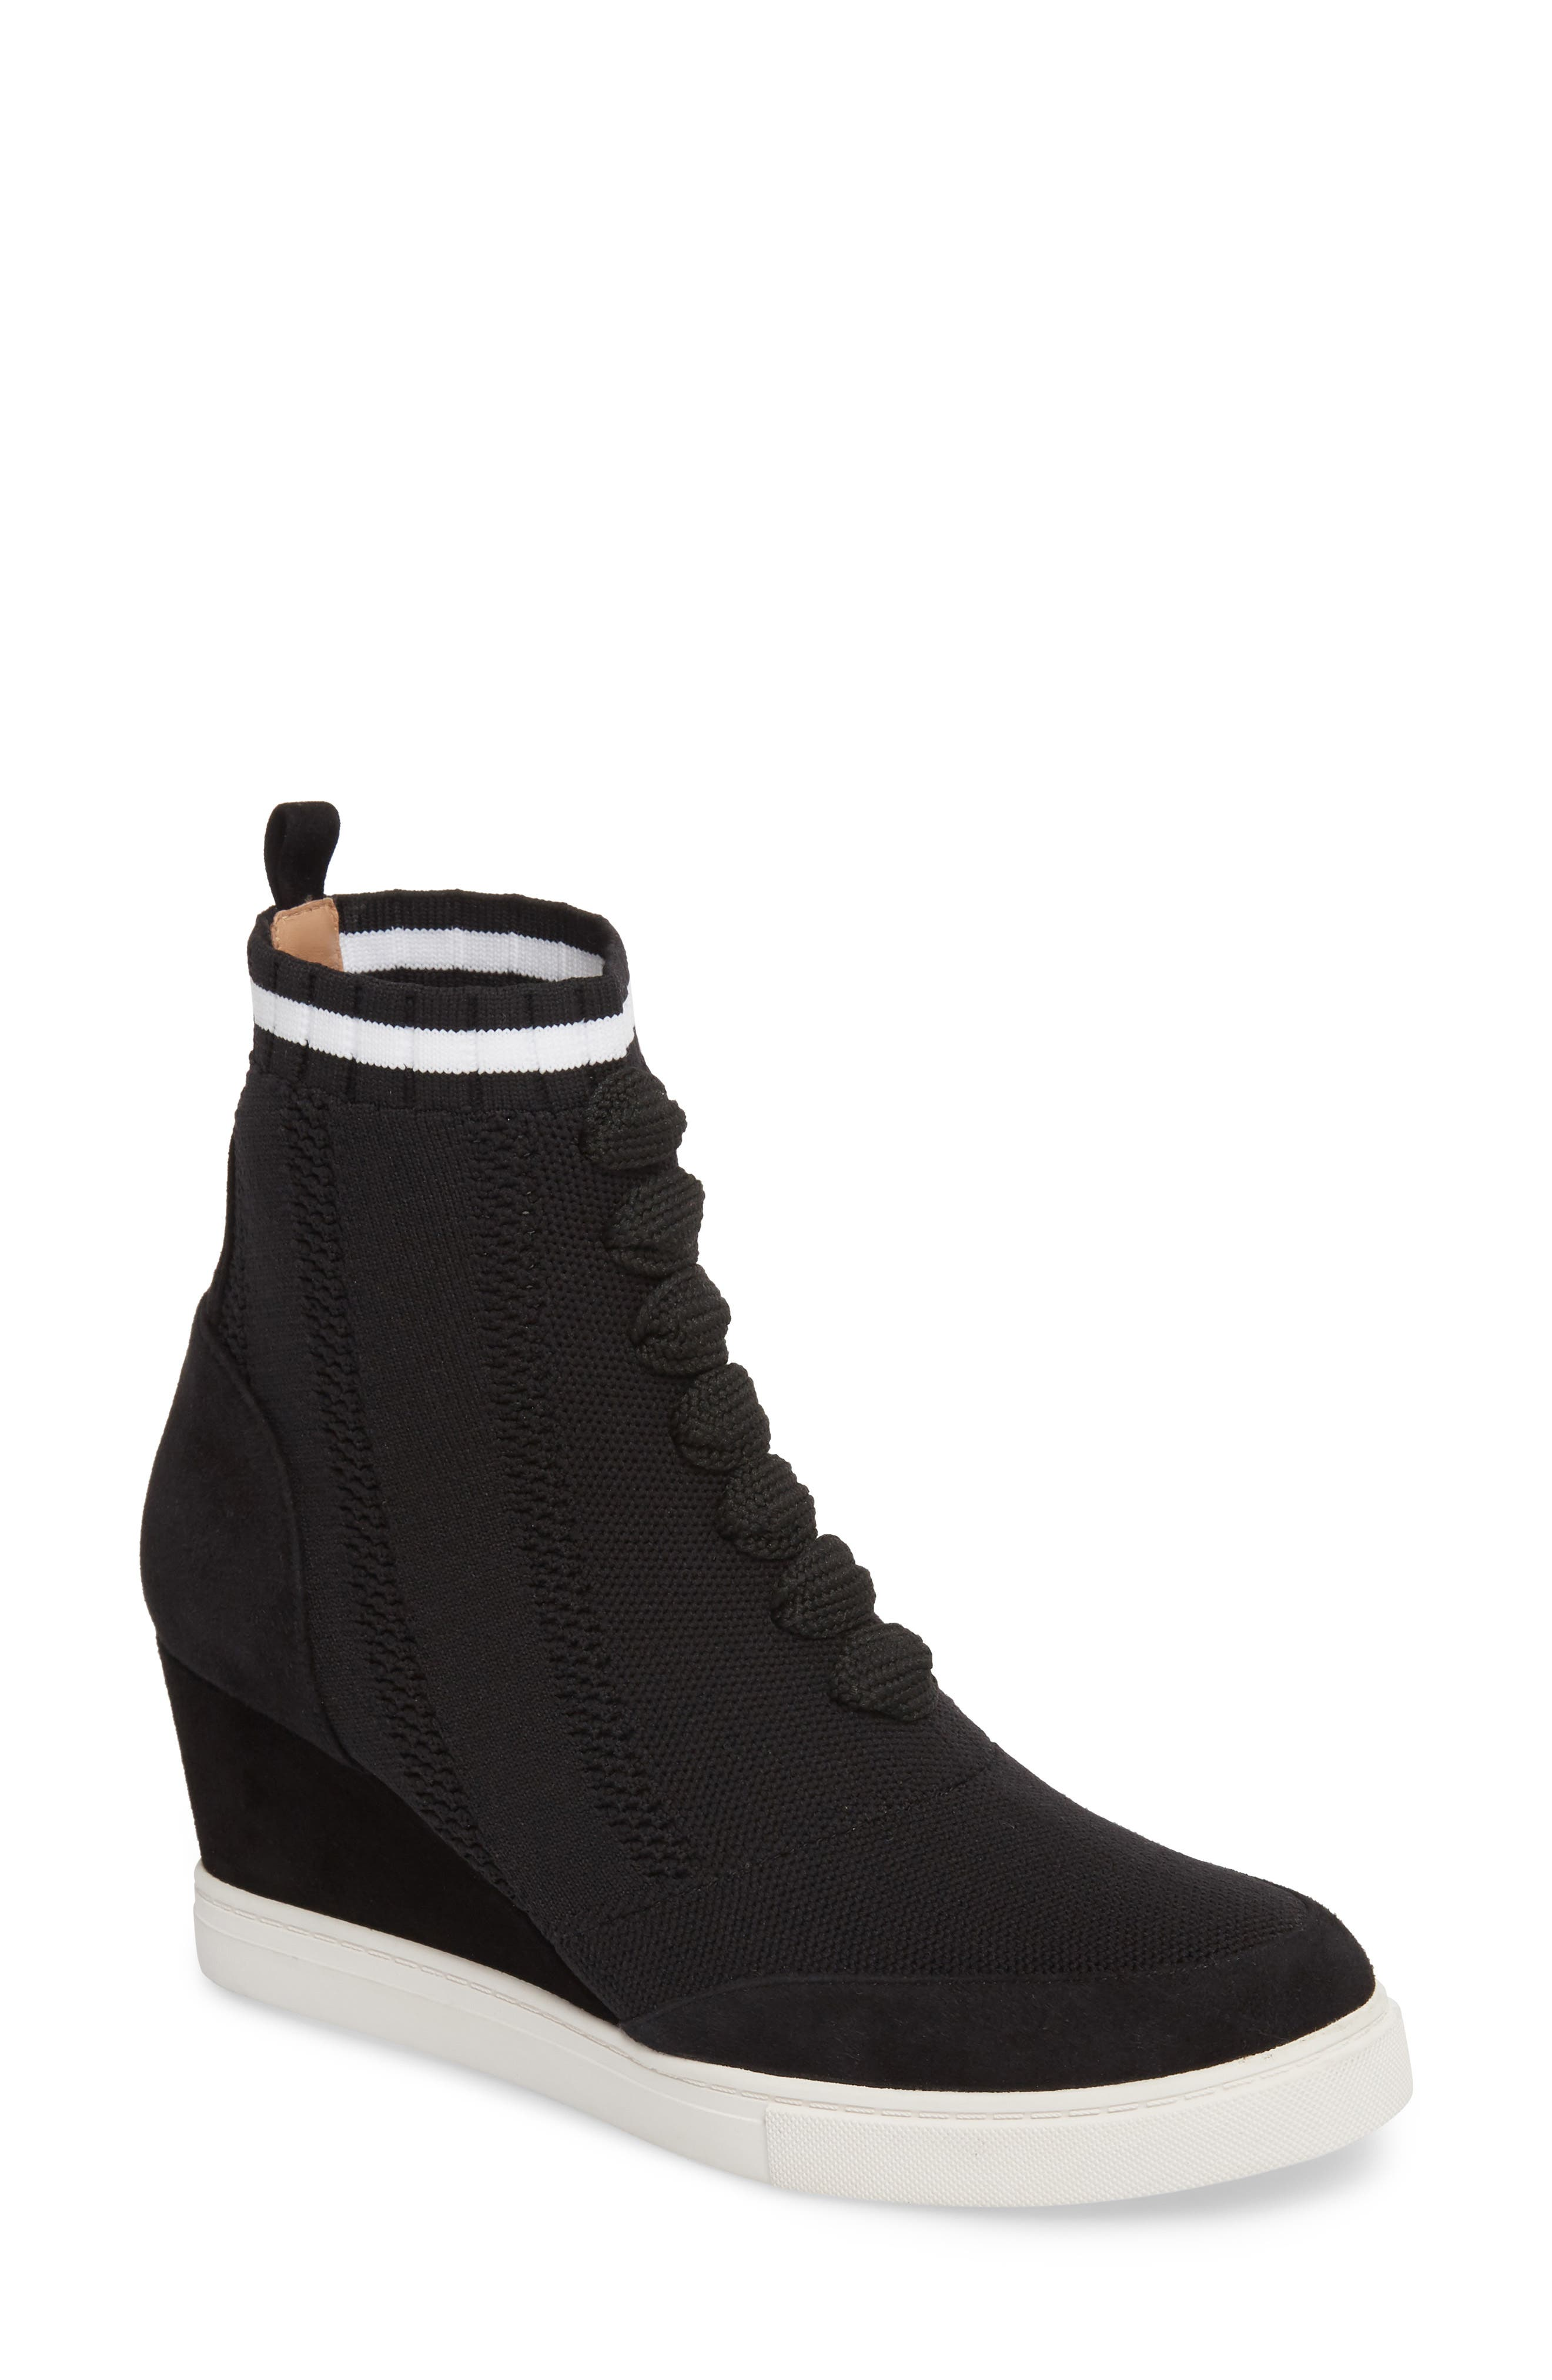 Fabiana Wedge Sneaker,                             Main thumbnail 1, color,                             BLACK SUEDE